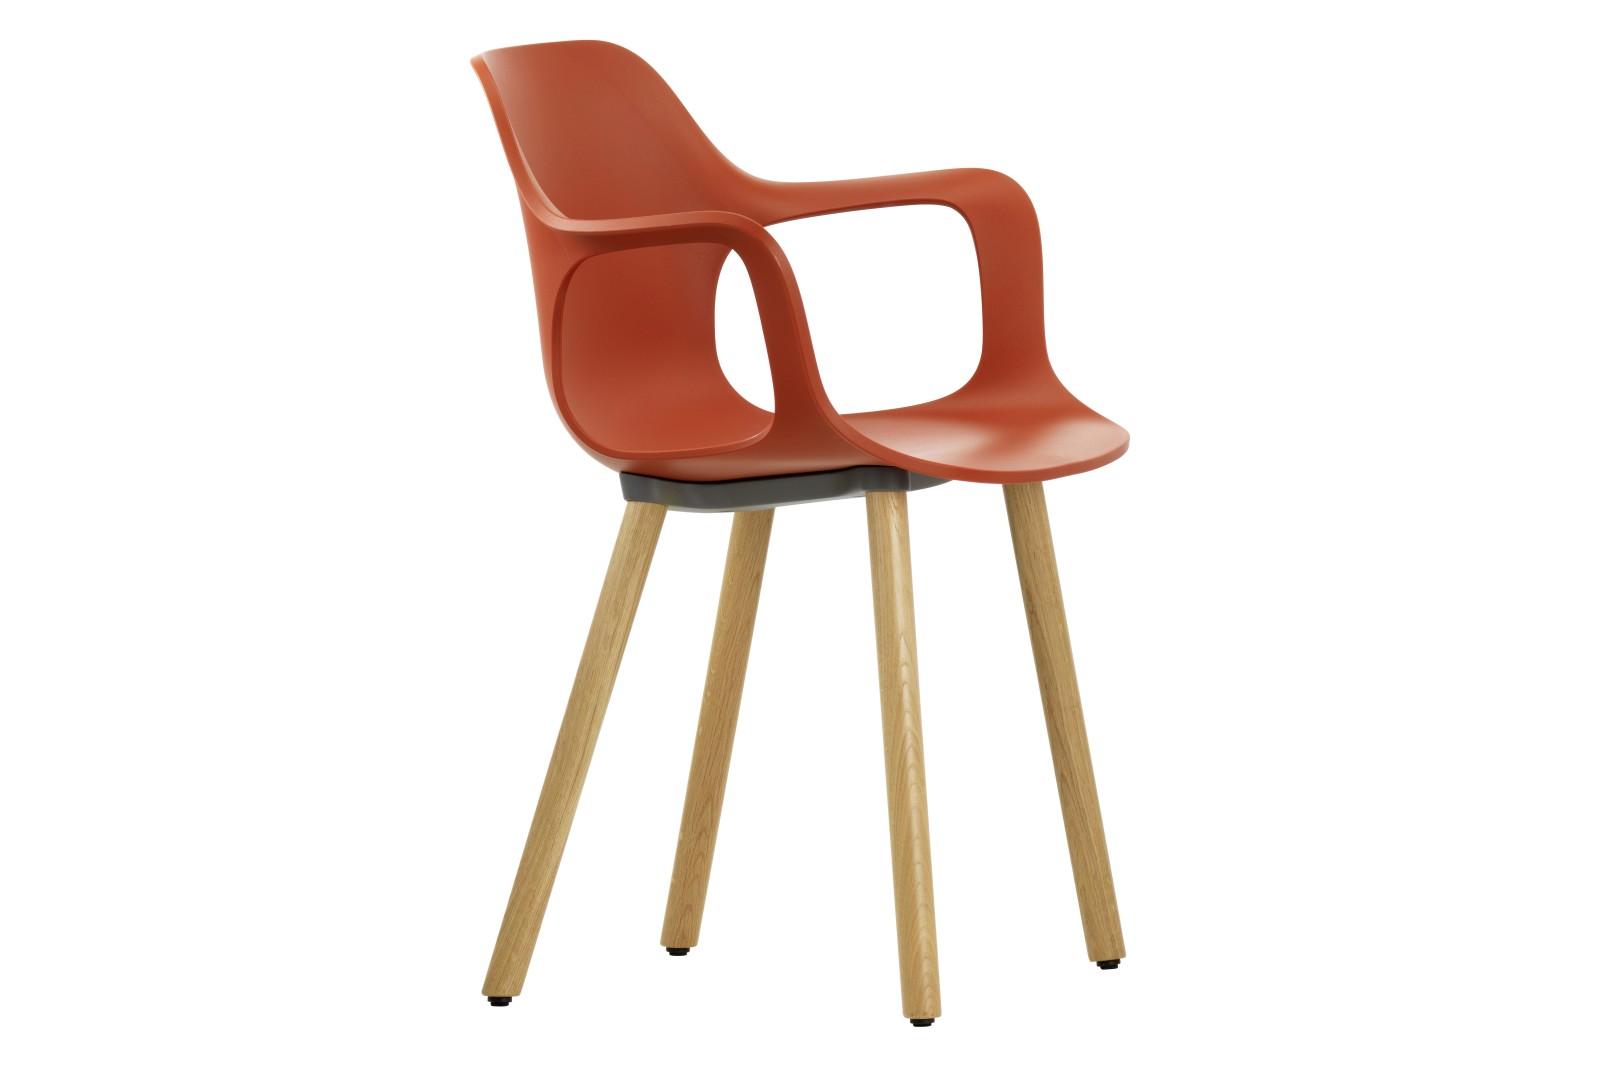 HAL Wood Base Armchair 29 brick, 04 glides for carpet, Natural oak with protective varnish